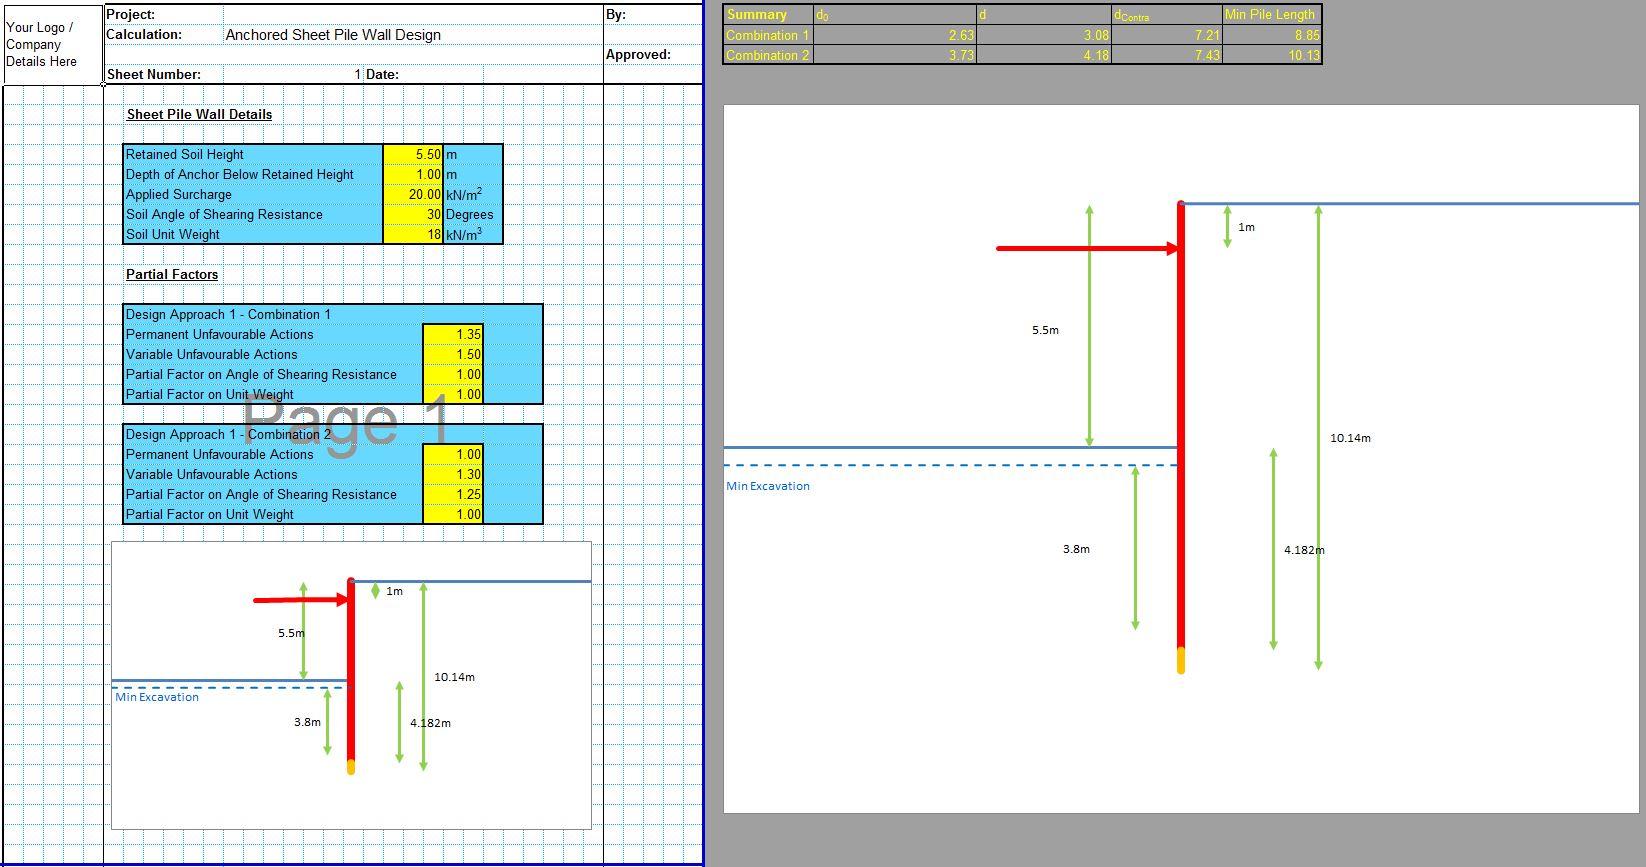 Anchored Sheet Pile Wall Design Spreadsheet 1